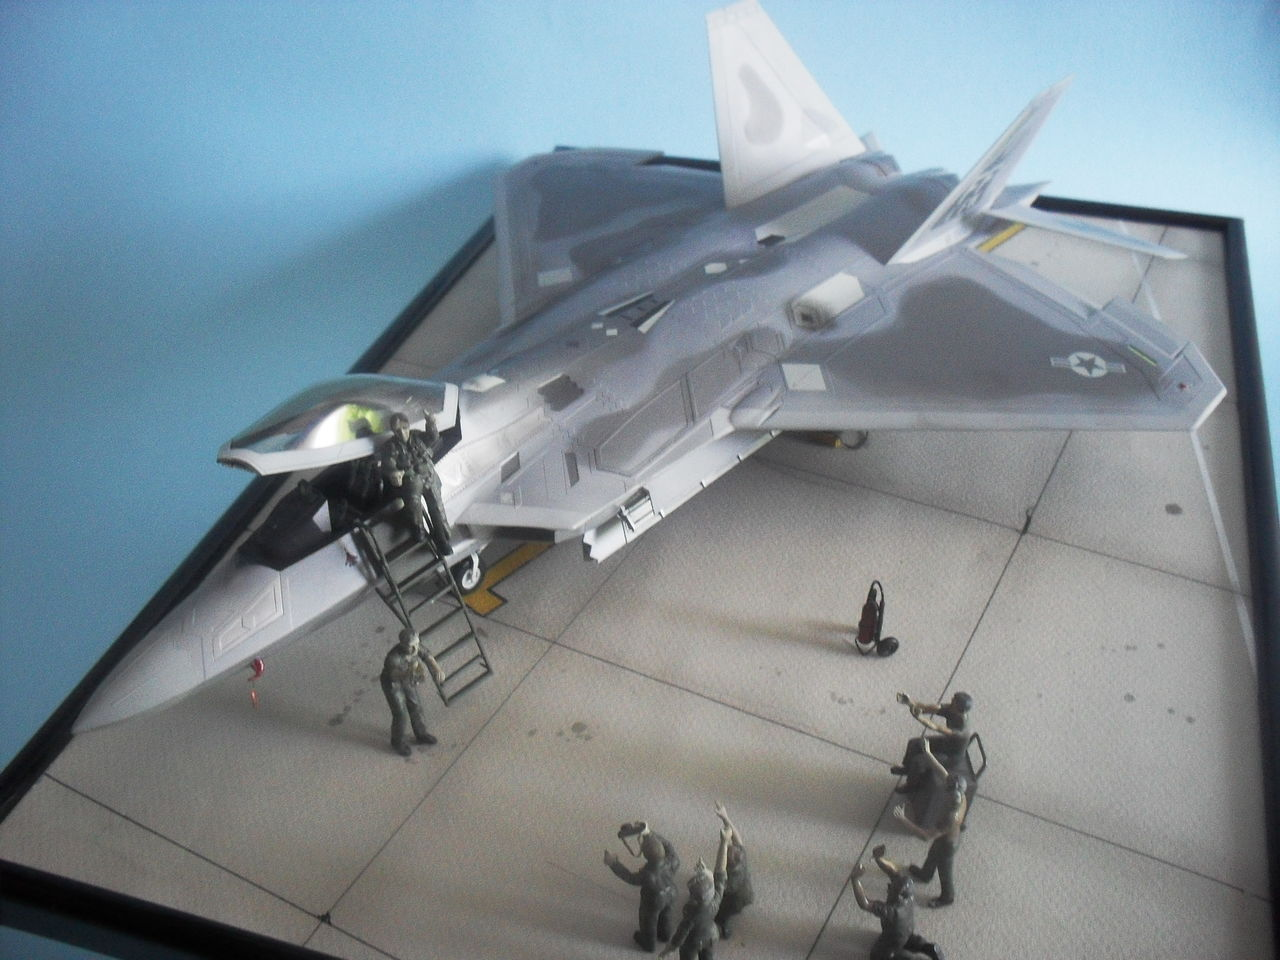 "F/A-22A  1/48  Hasegawa...""σε οσους αρεσουμε, για τους αλλους δεν θα μπορεσουμε!!!"" - Σελίδα 2 Image"